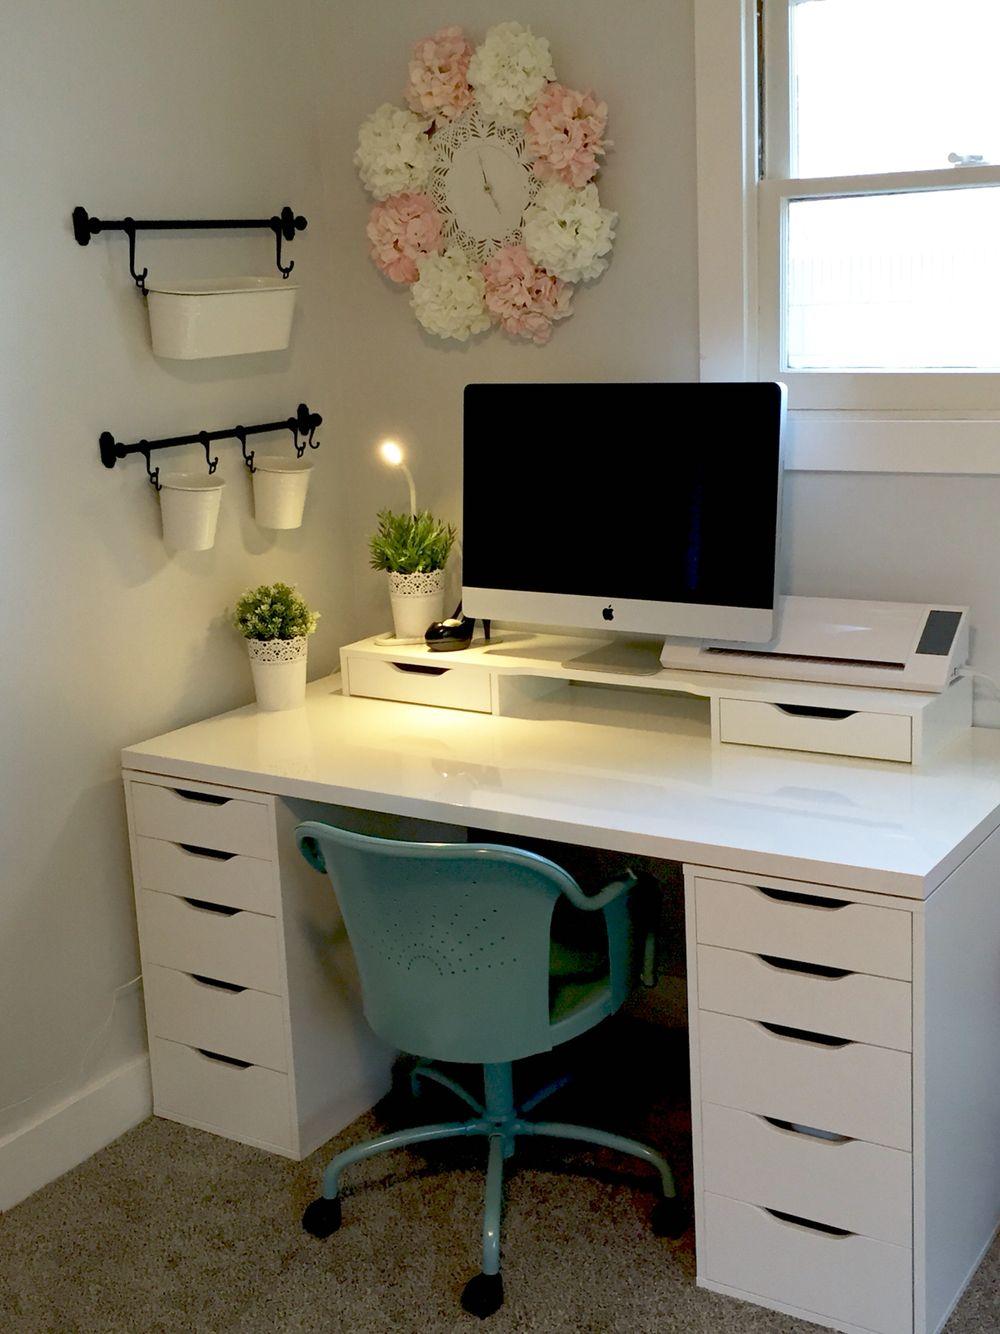 The 25 Best Ikea Alex Desk Ideas On Pinterest Desks